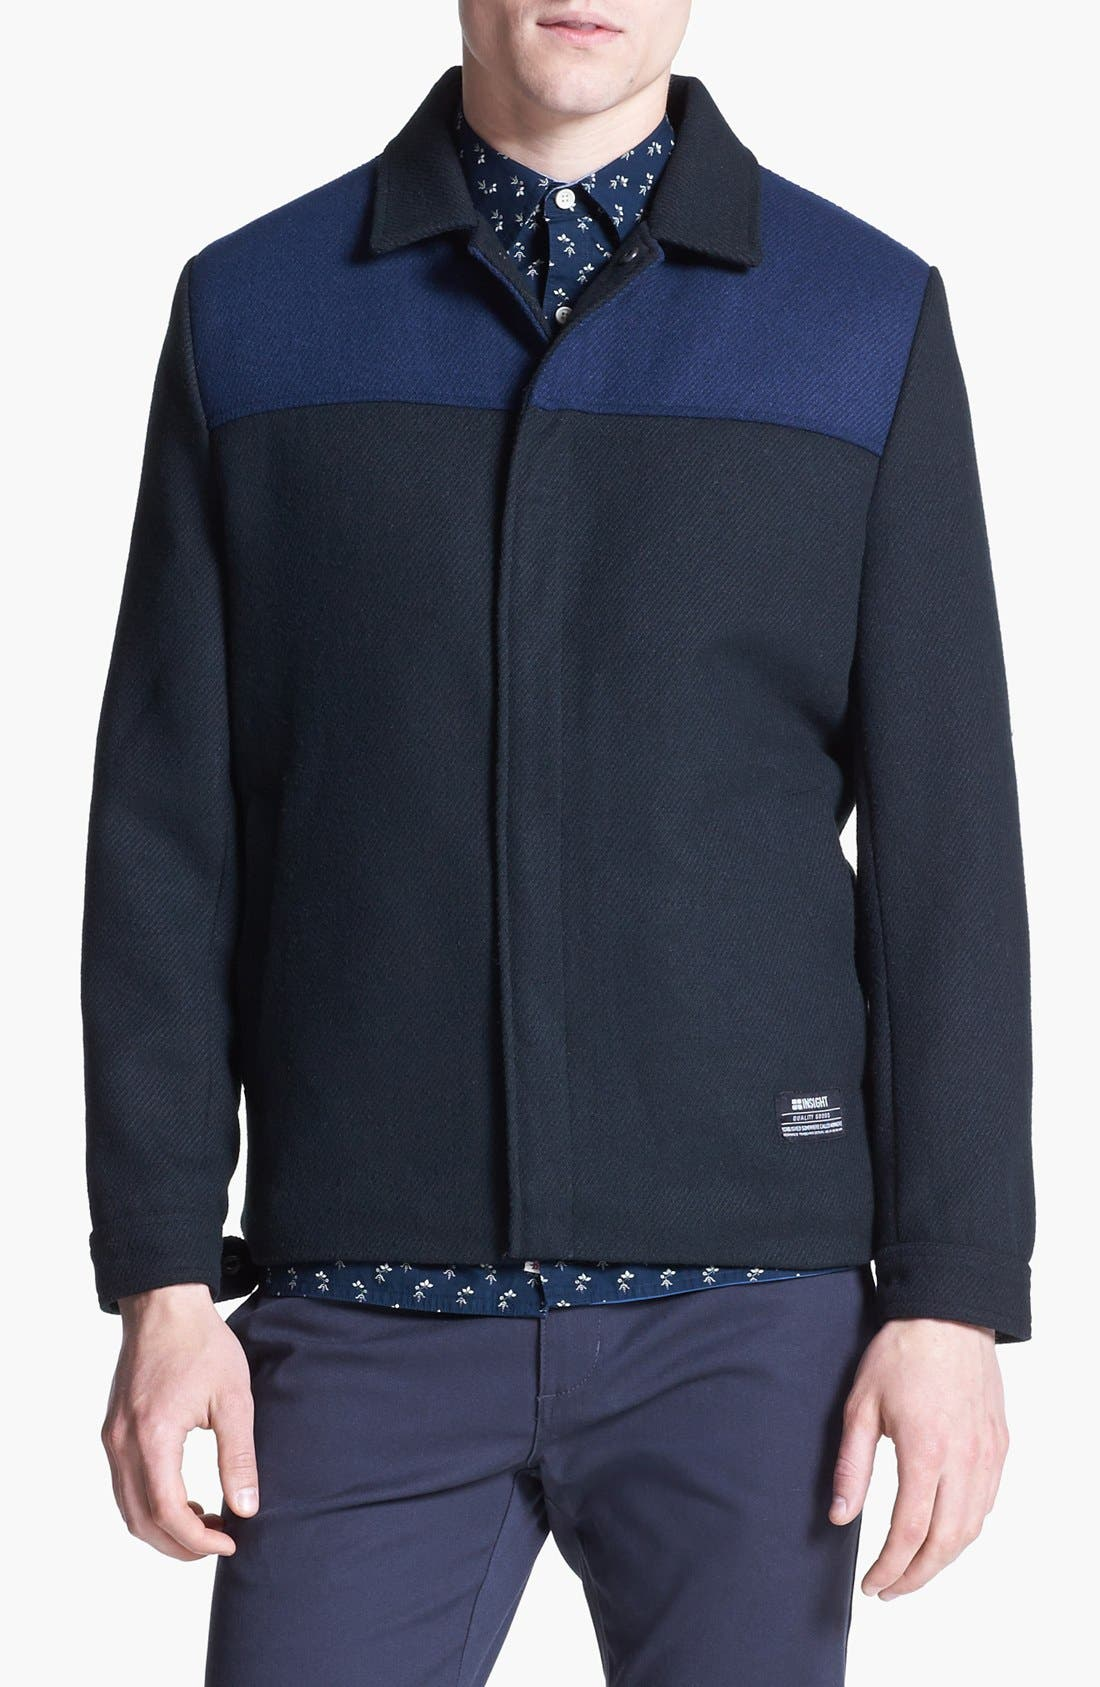 Main Image - Insight 'Blazin' Knit Jacket